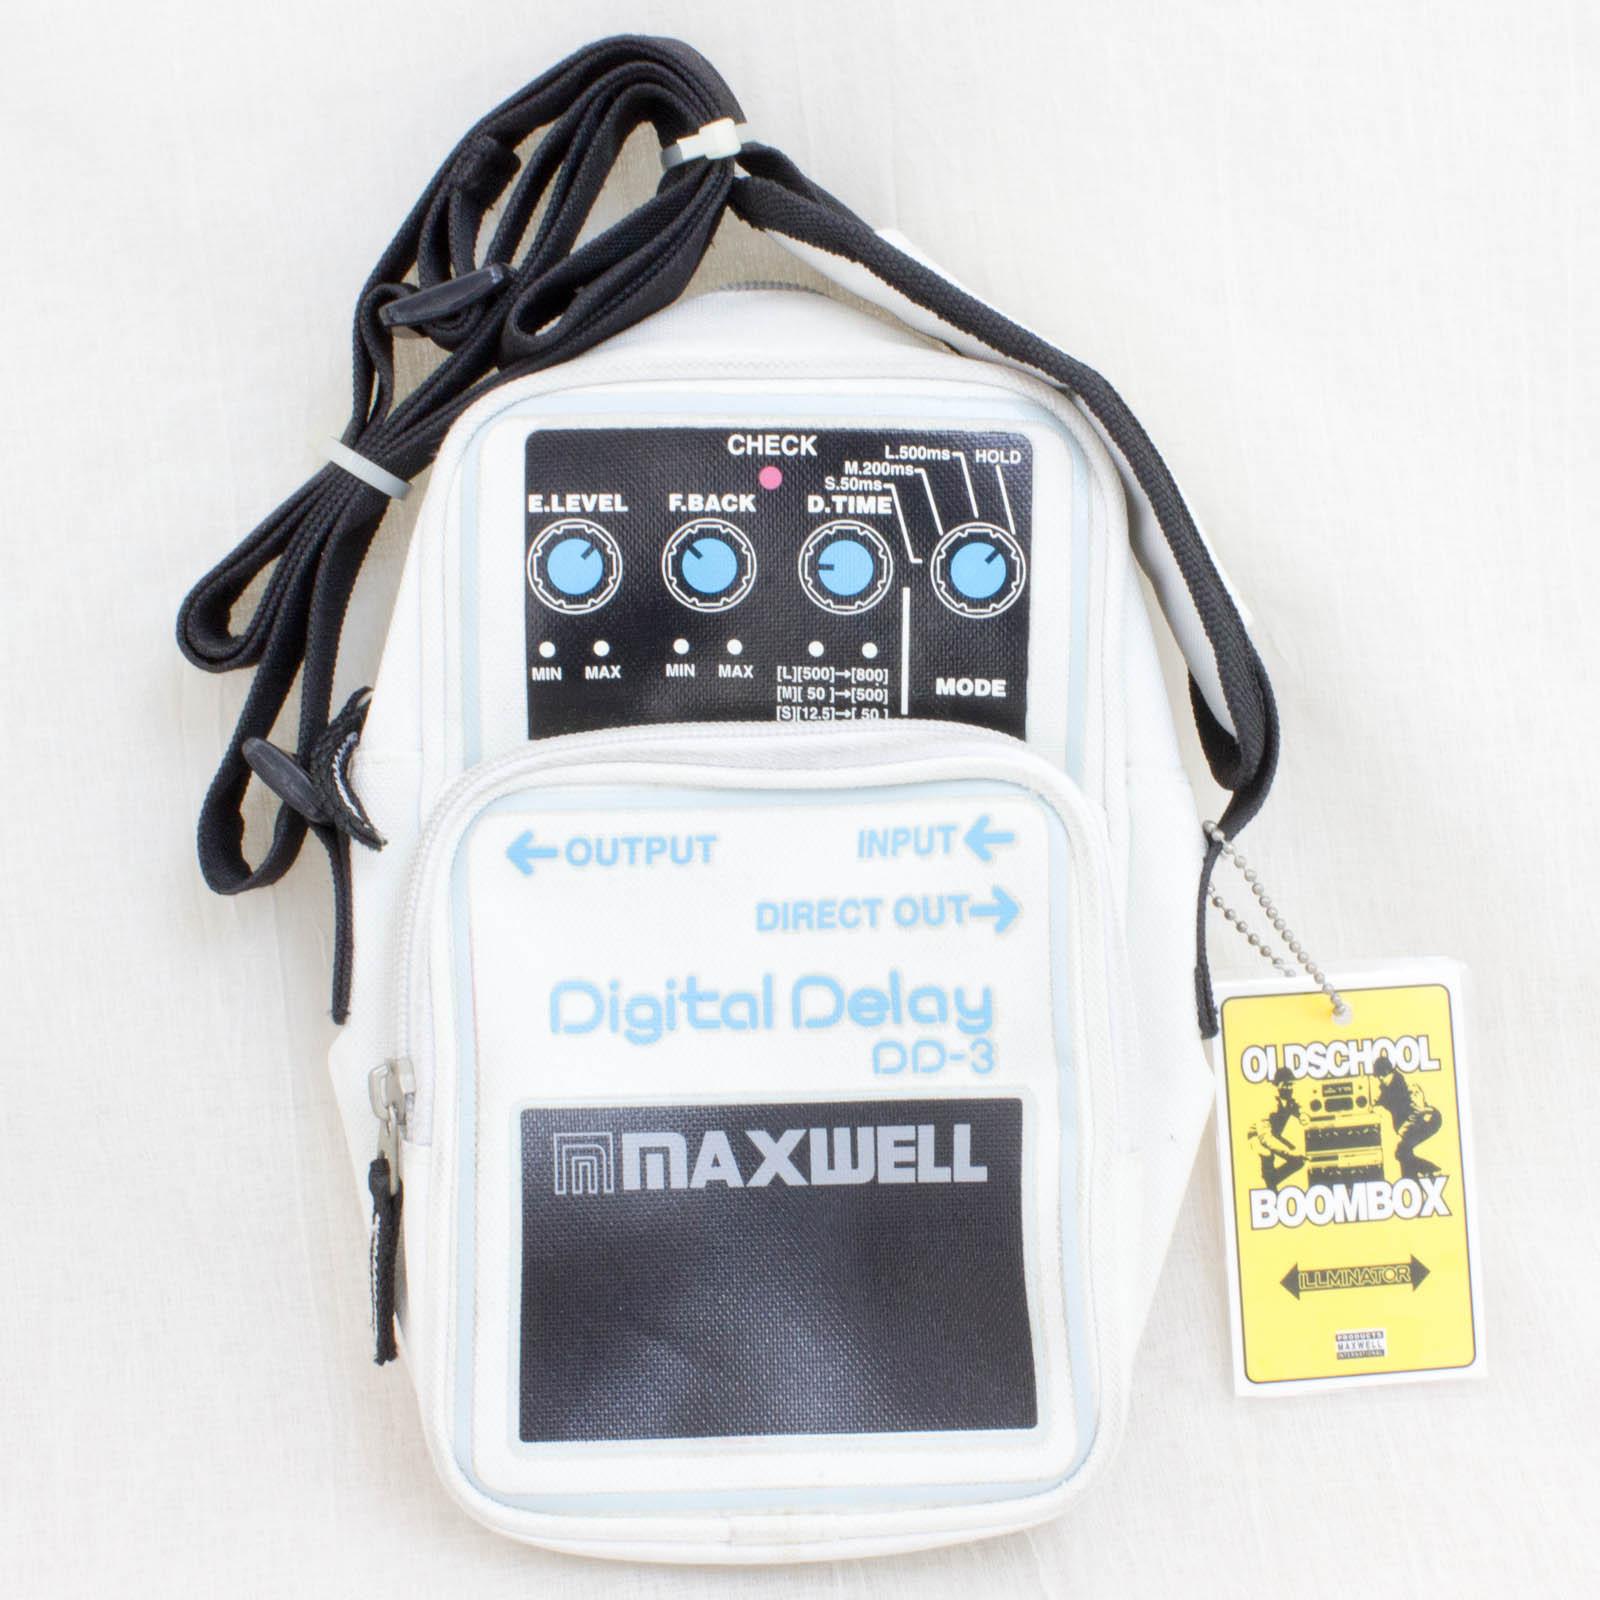 RARE! BOSS Digital Delay DD-3 Type Shoulder Bag 9x5 inch MAXWELL ILLUMINATOR